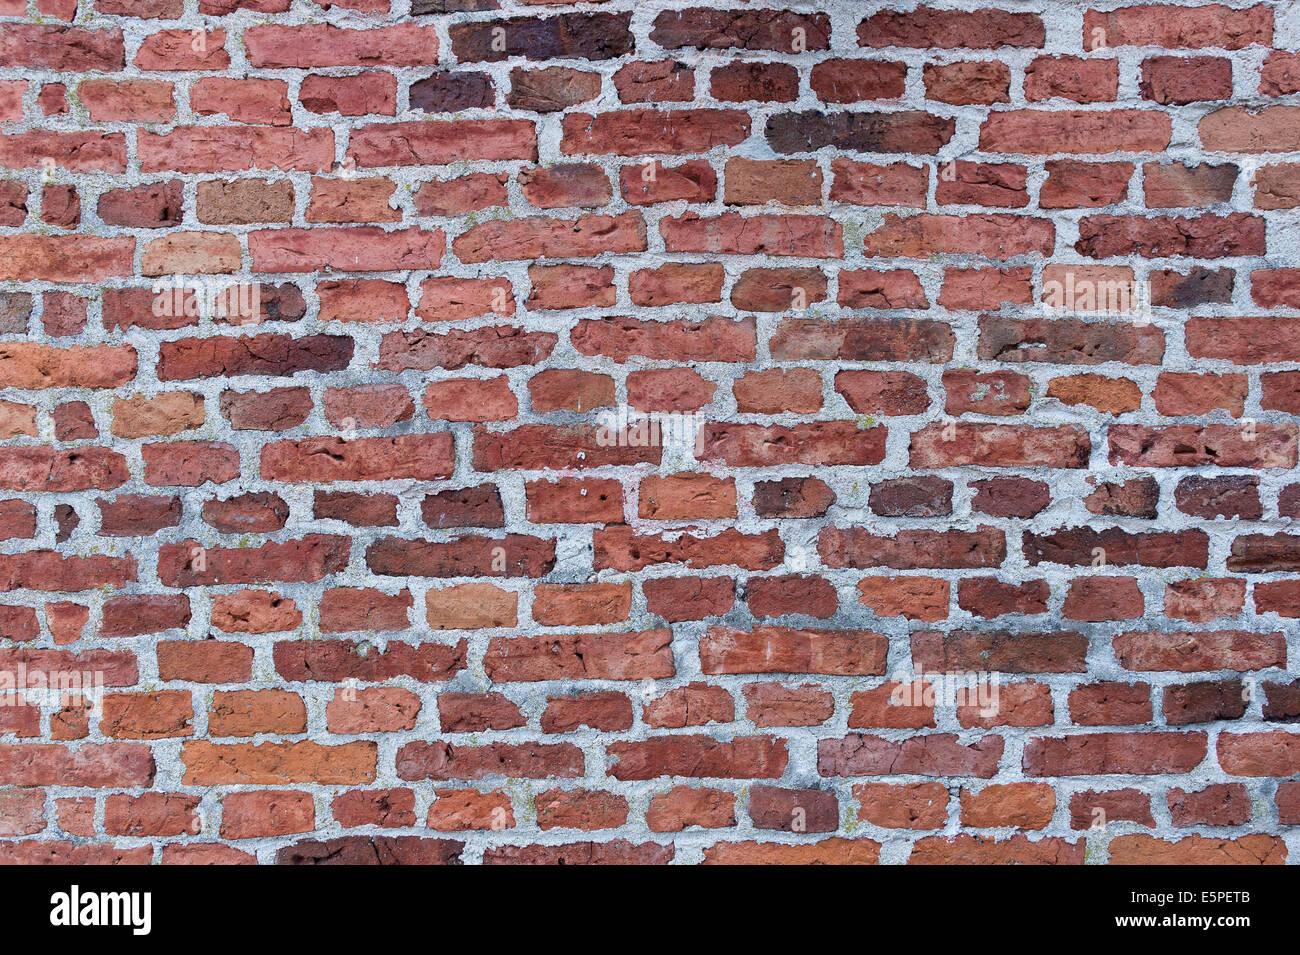 Wall made of red bricks, Karlskrona, Blekinge län, Sweden - Stock Image